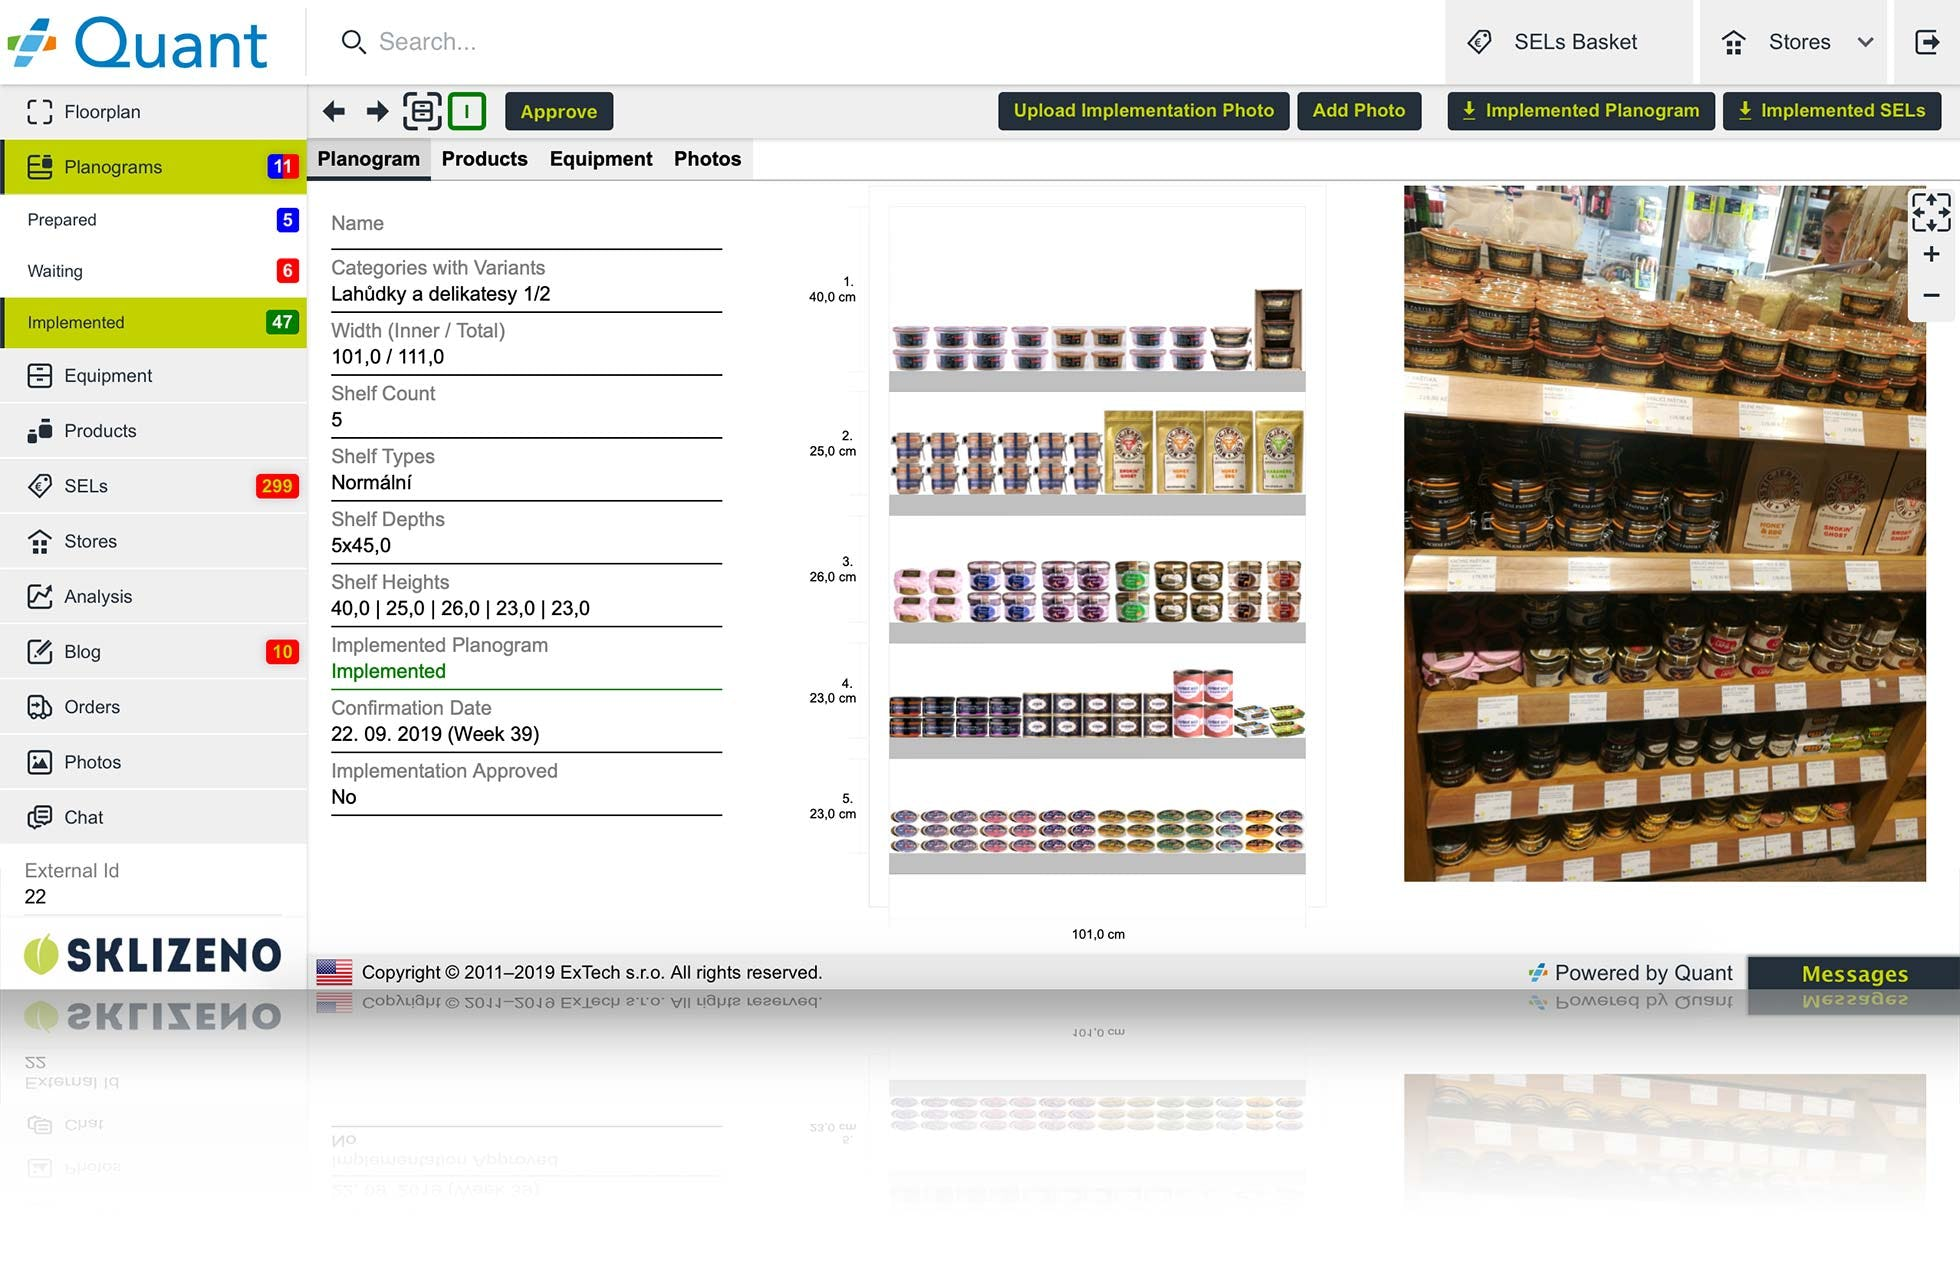 Quant Software - Planogram Compliance Check via Implementation Photo